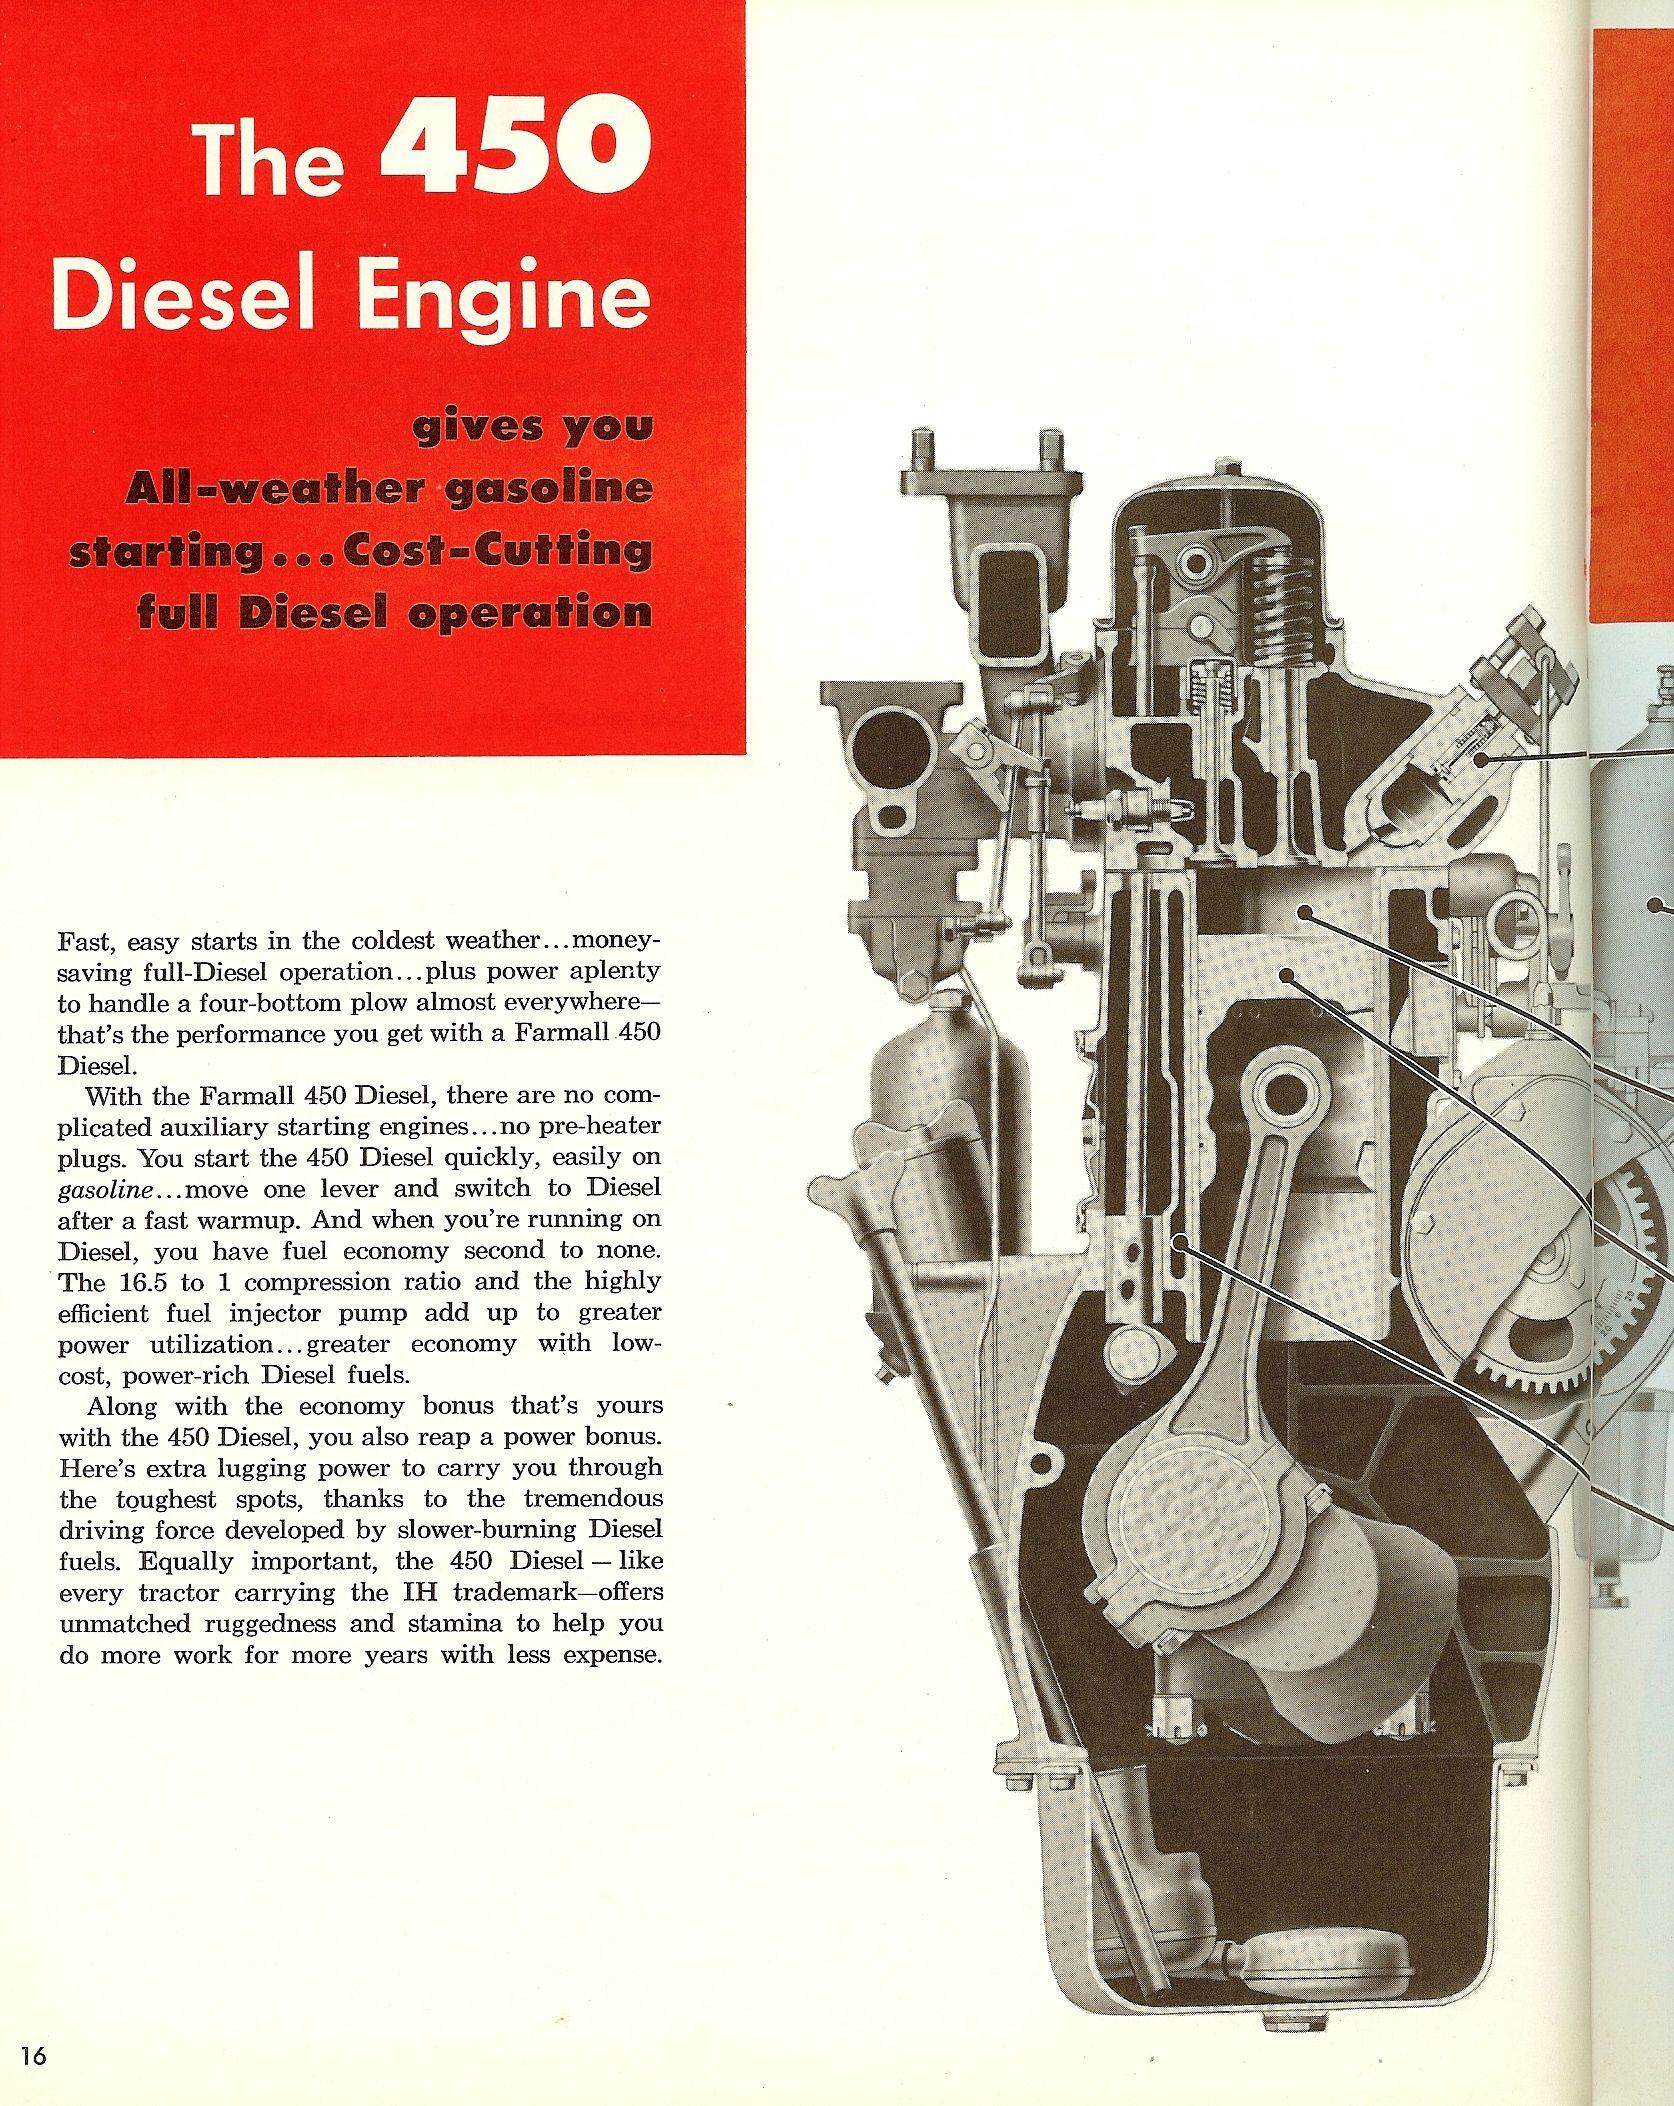 Farmall 450 Diesel Engine Farmall Classic Cars Muscle Diesel